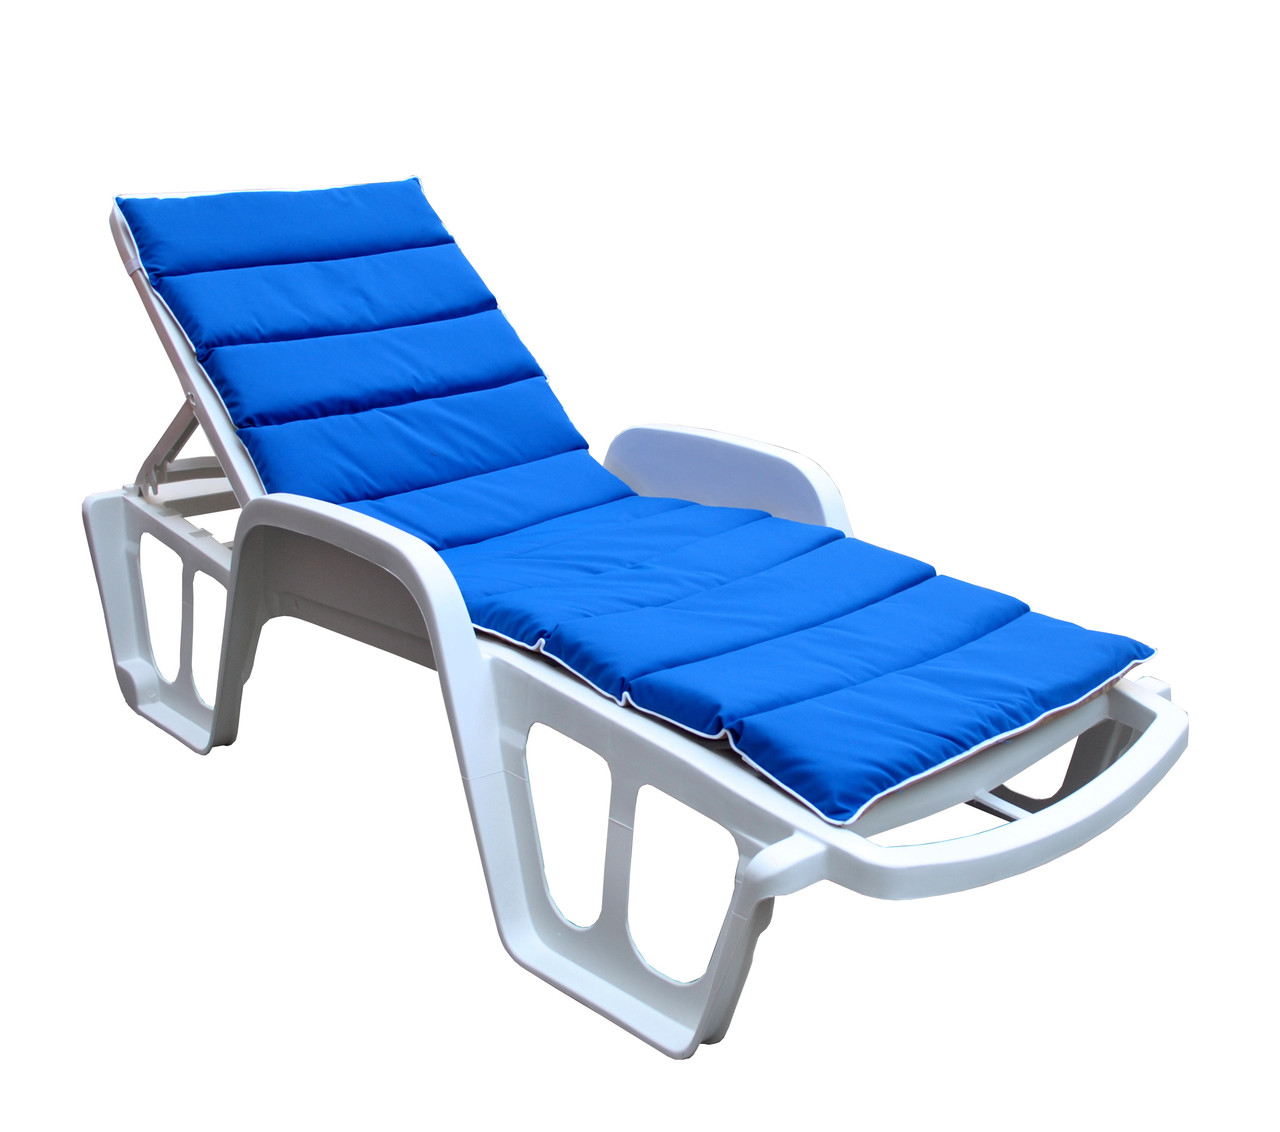 Матрас для лежака ONDA дралон 2821